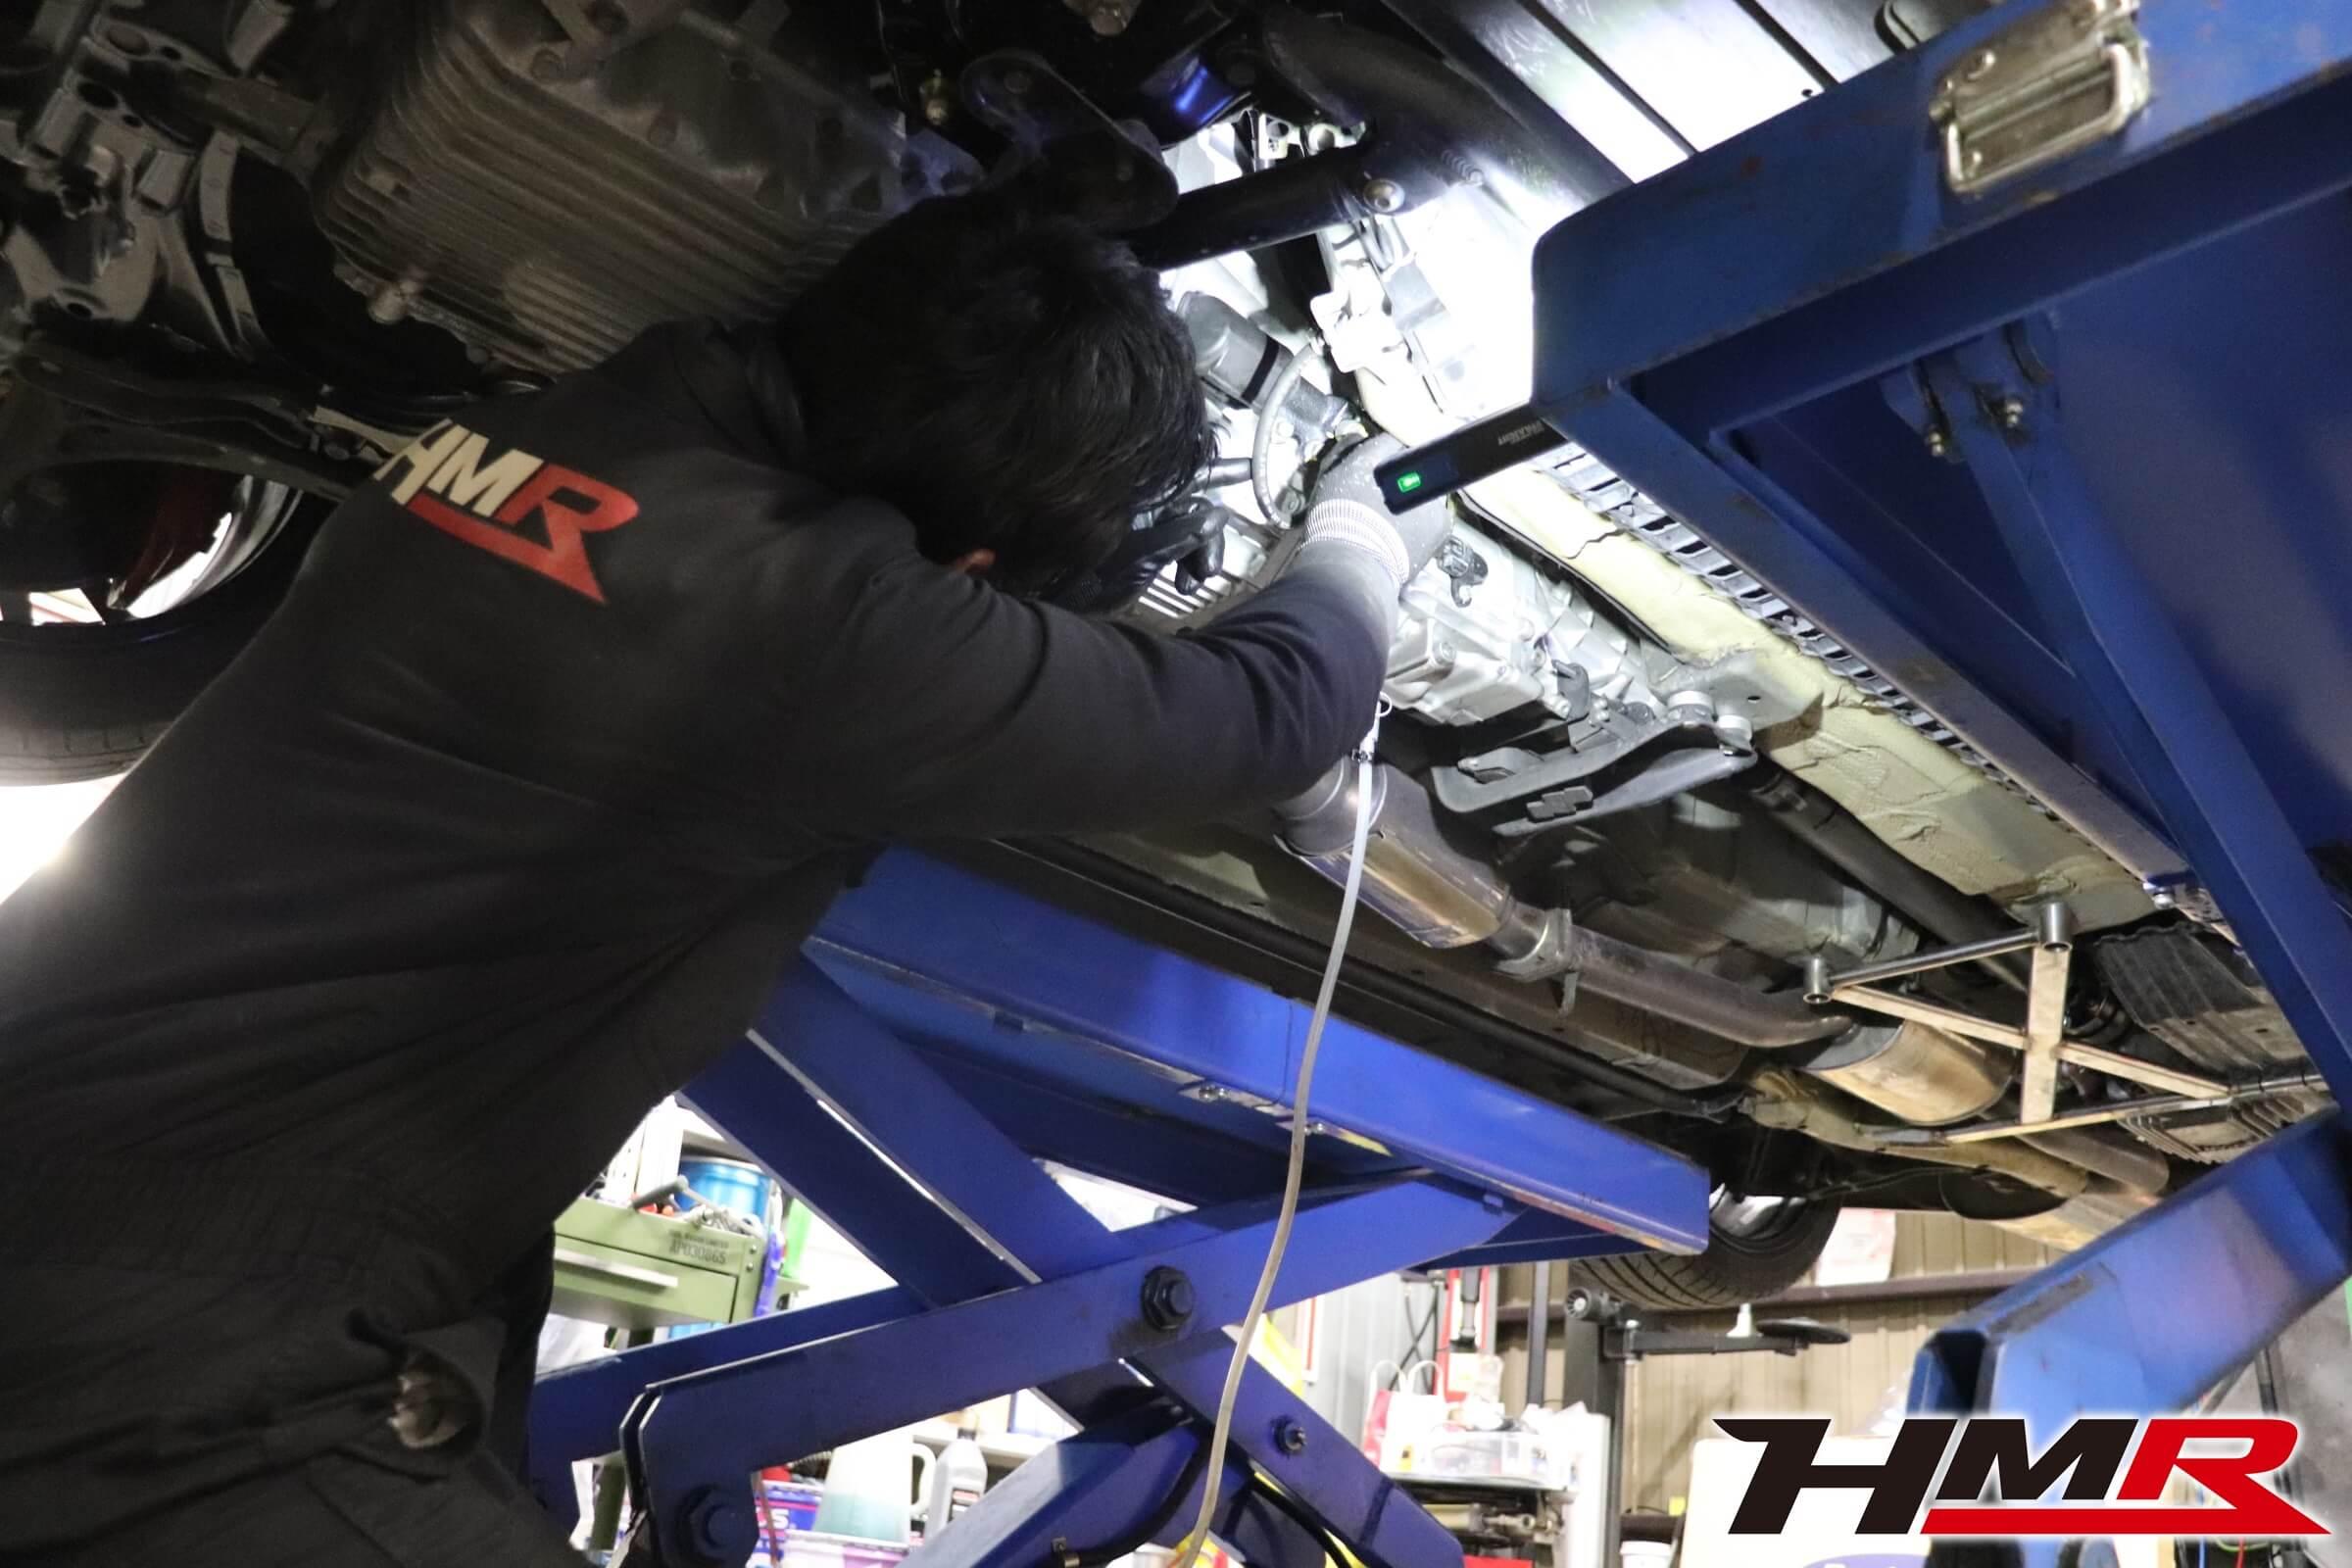 HMRS2000 J'sracing強化クラッチスレーブシリンダー交換